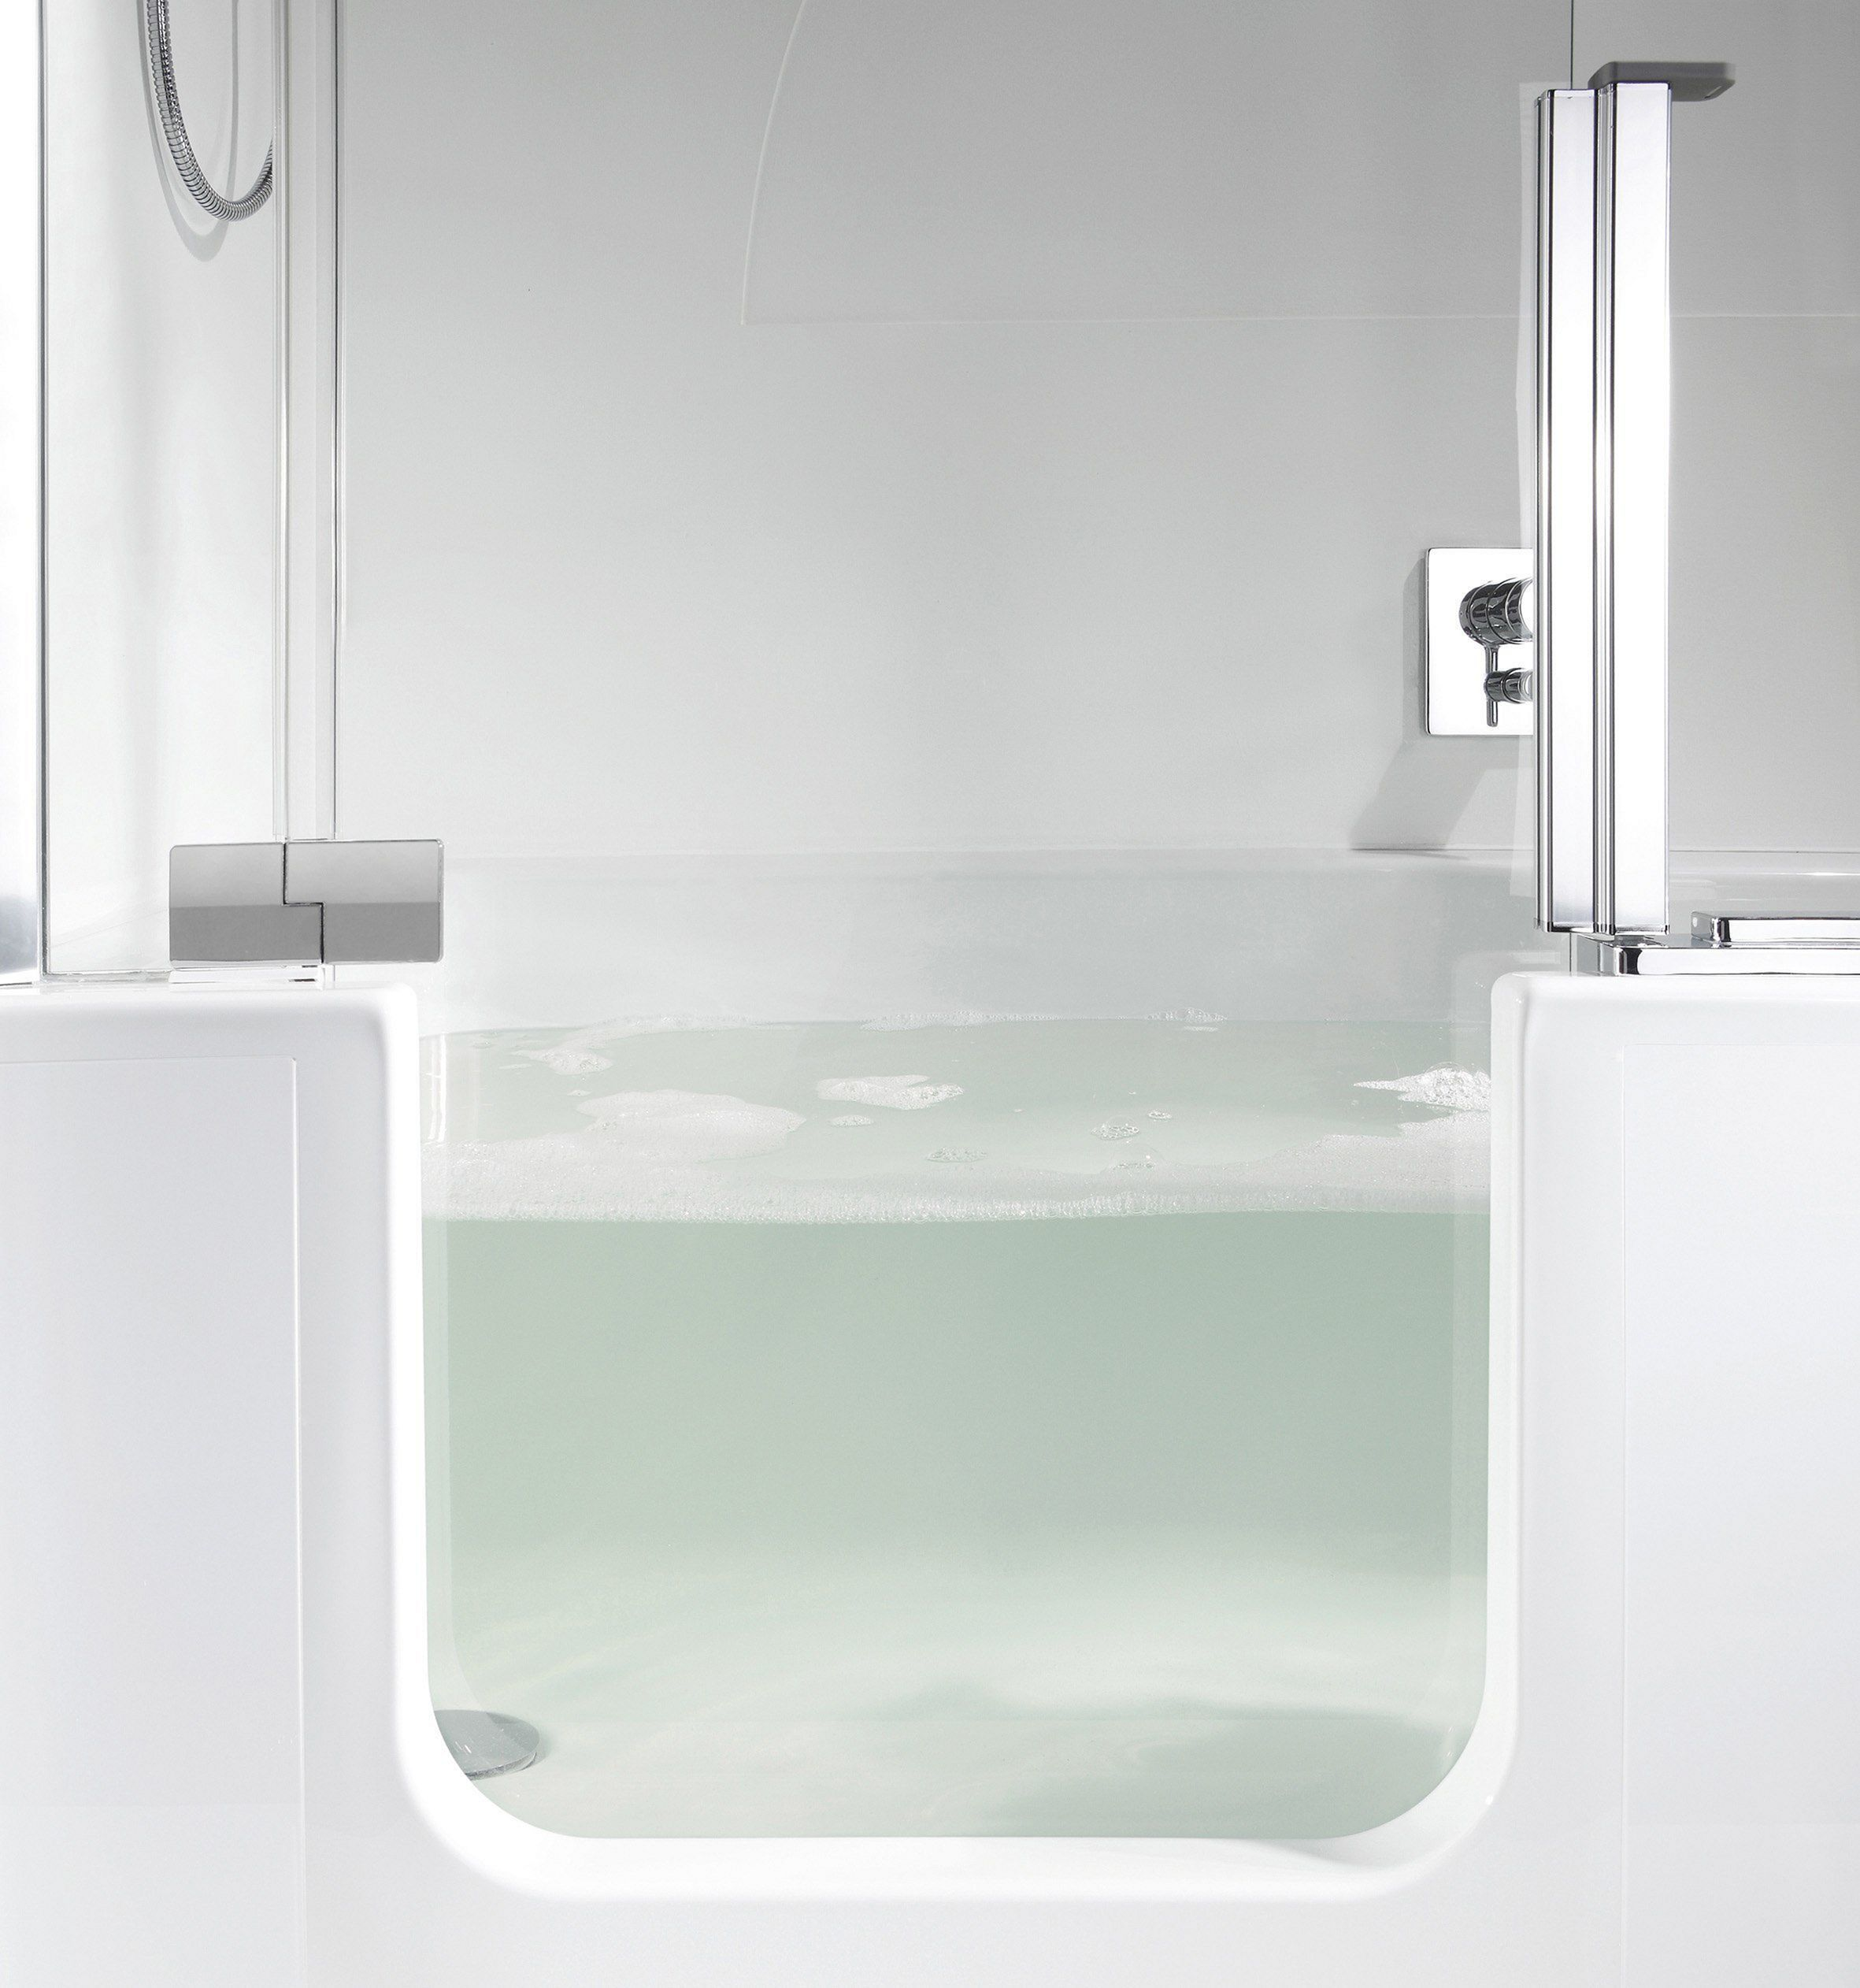 Epic Top 25 Modern Bath Shower Combination Units Ideas Https Decoredo Com 18682 Top 25 Modern Bath Shower Combination Bathtub Shower Combo Tub Shower Combo